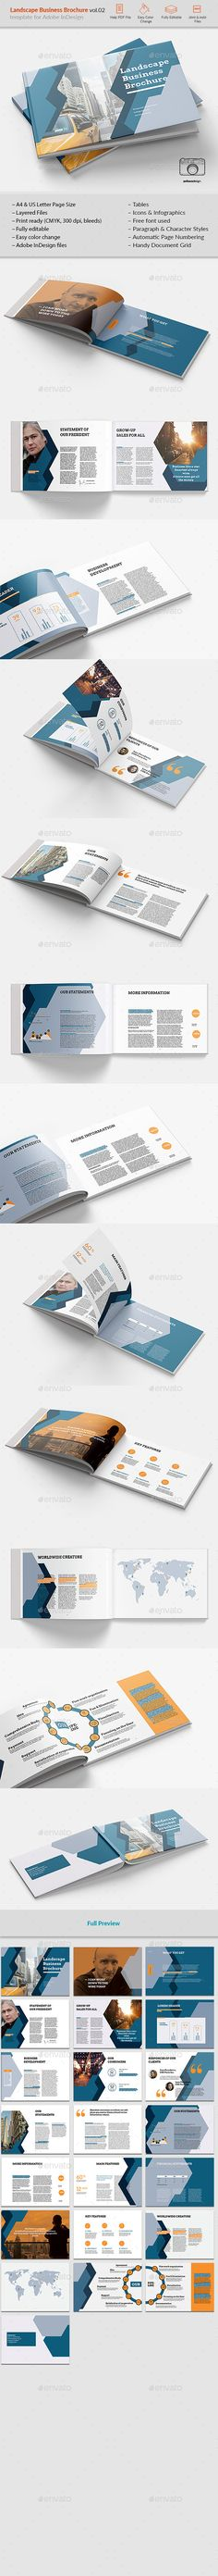 Landsape Business Brochure vol.02 - #Brochures Print #Templates Download here: https://graphicriver.net/item/landsape-business-brochure-vol02/19557099?ref=alena994